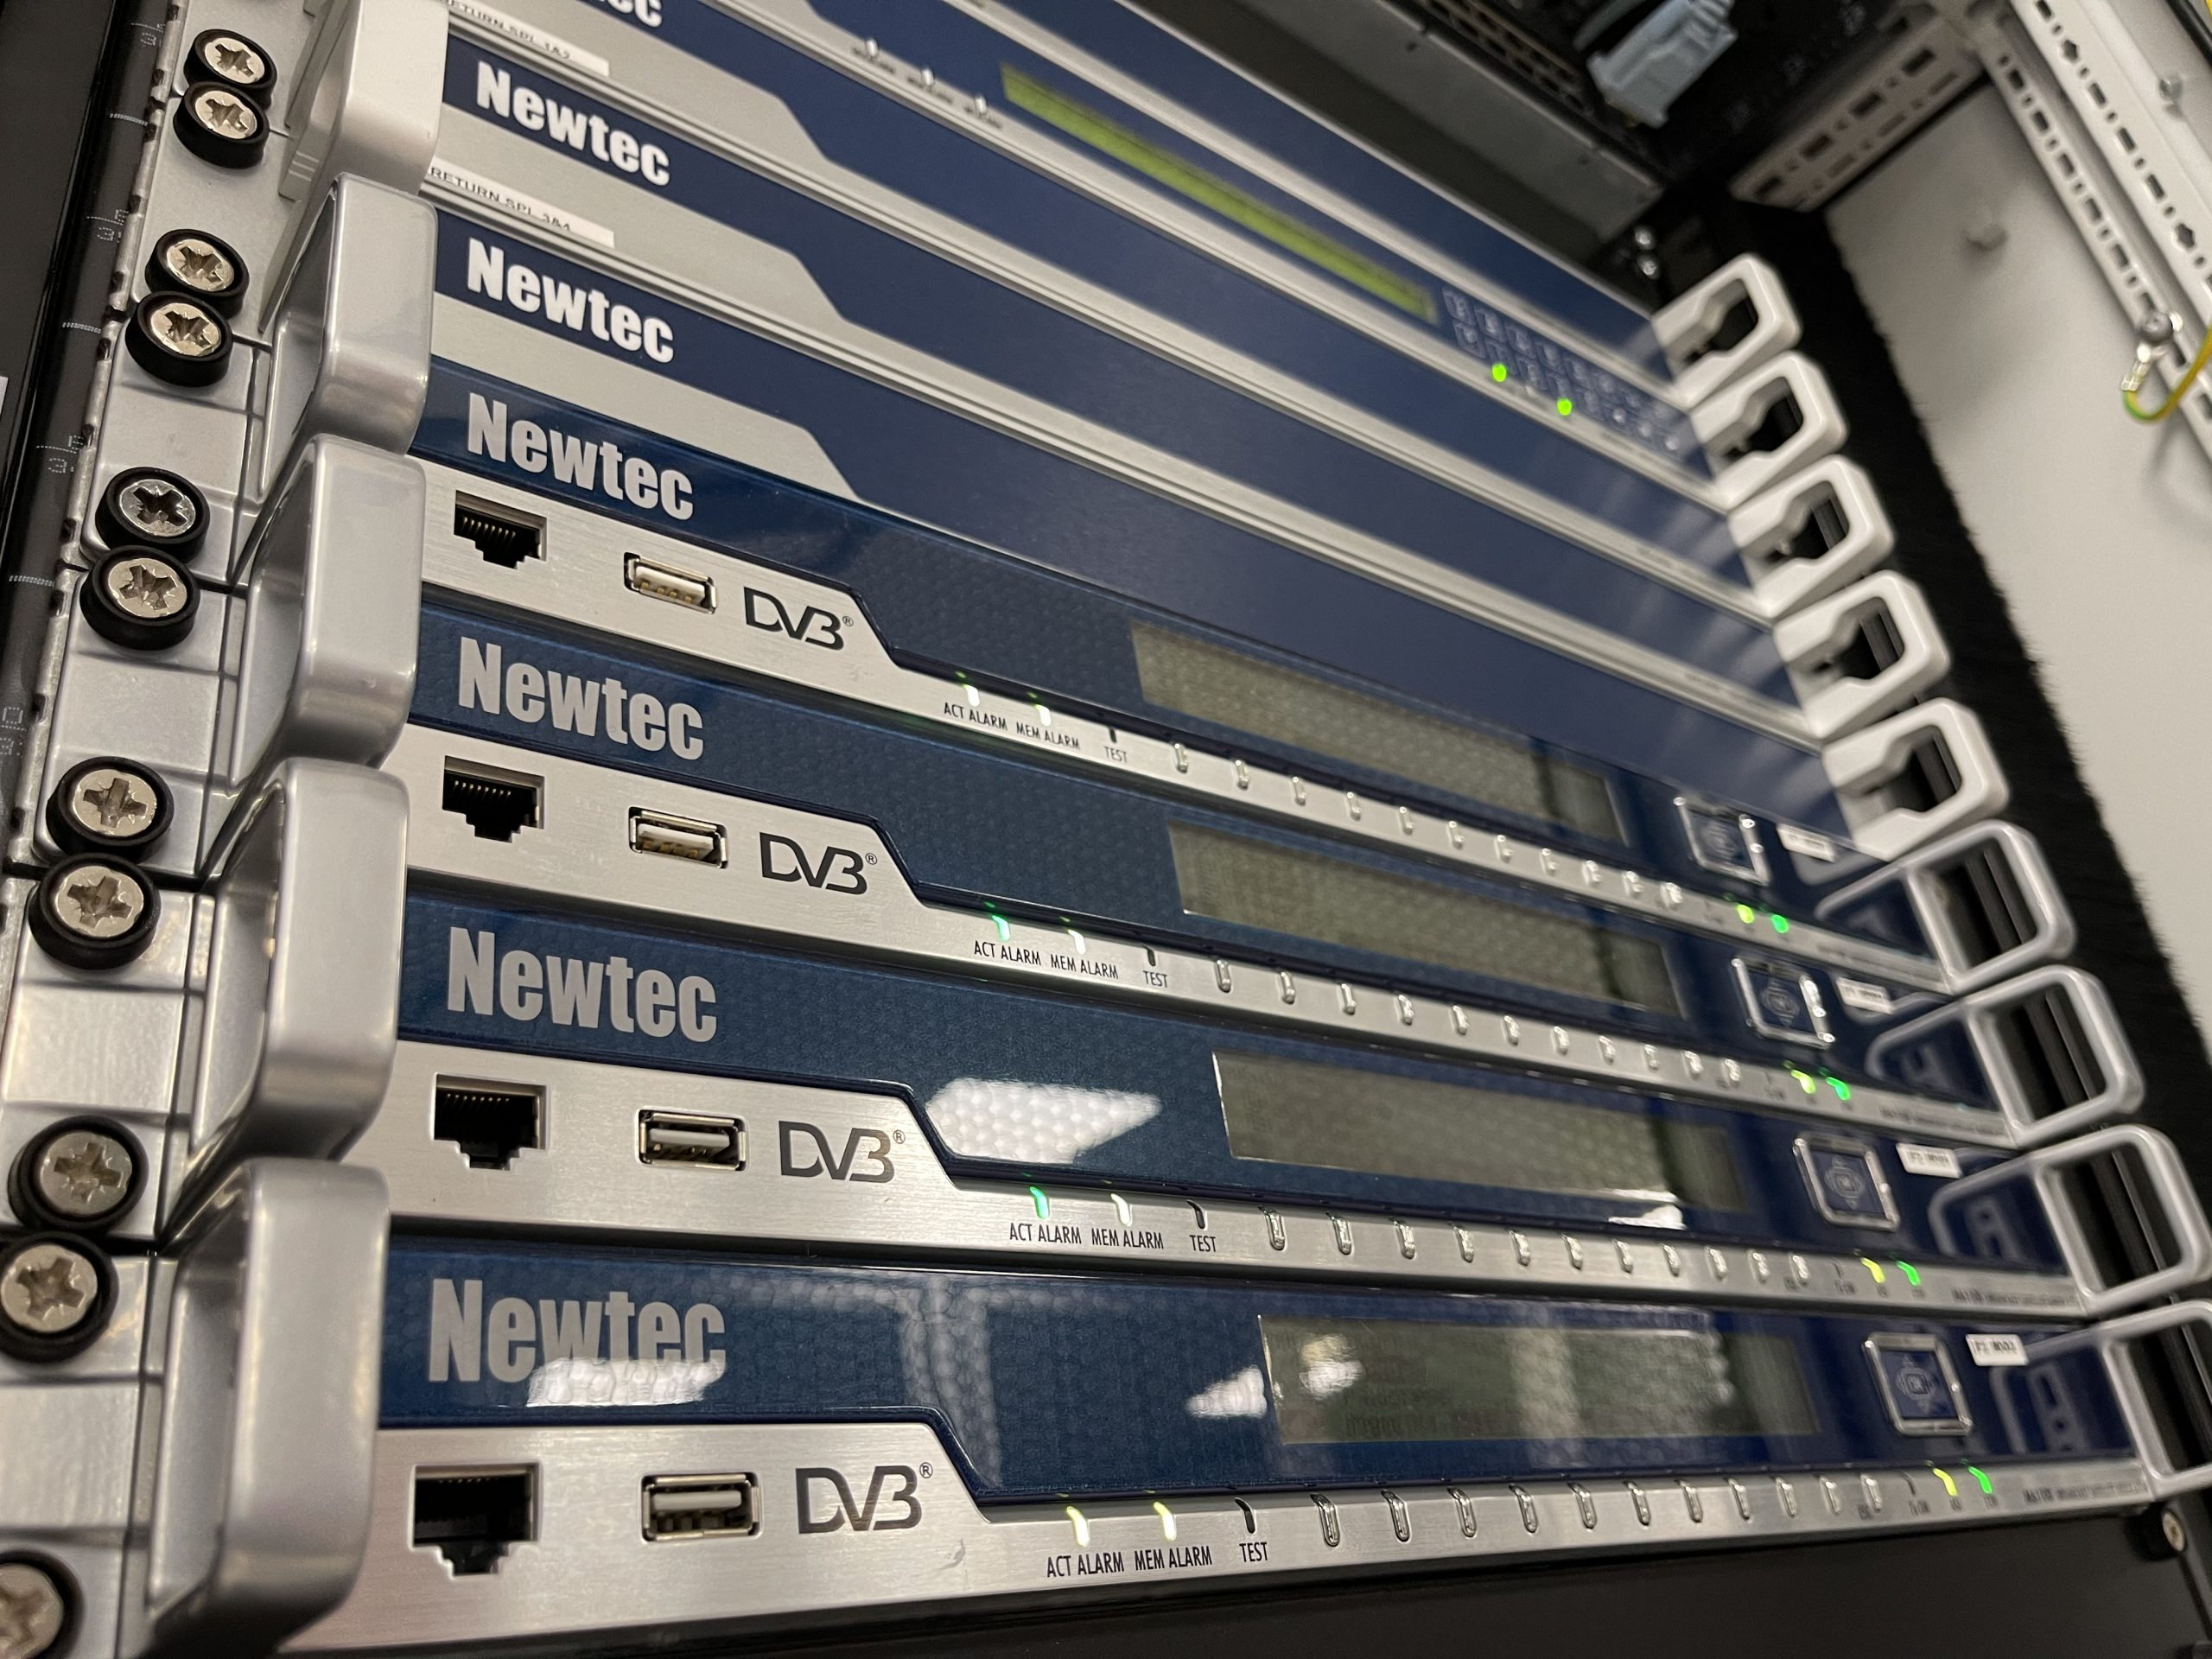 Newtec M6100 Broadcast Modulators installed